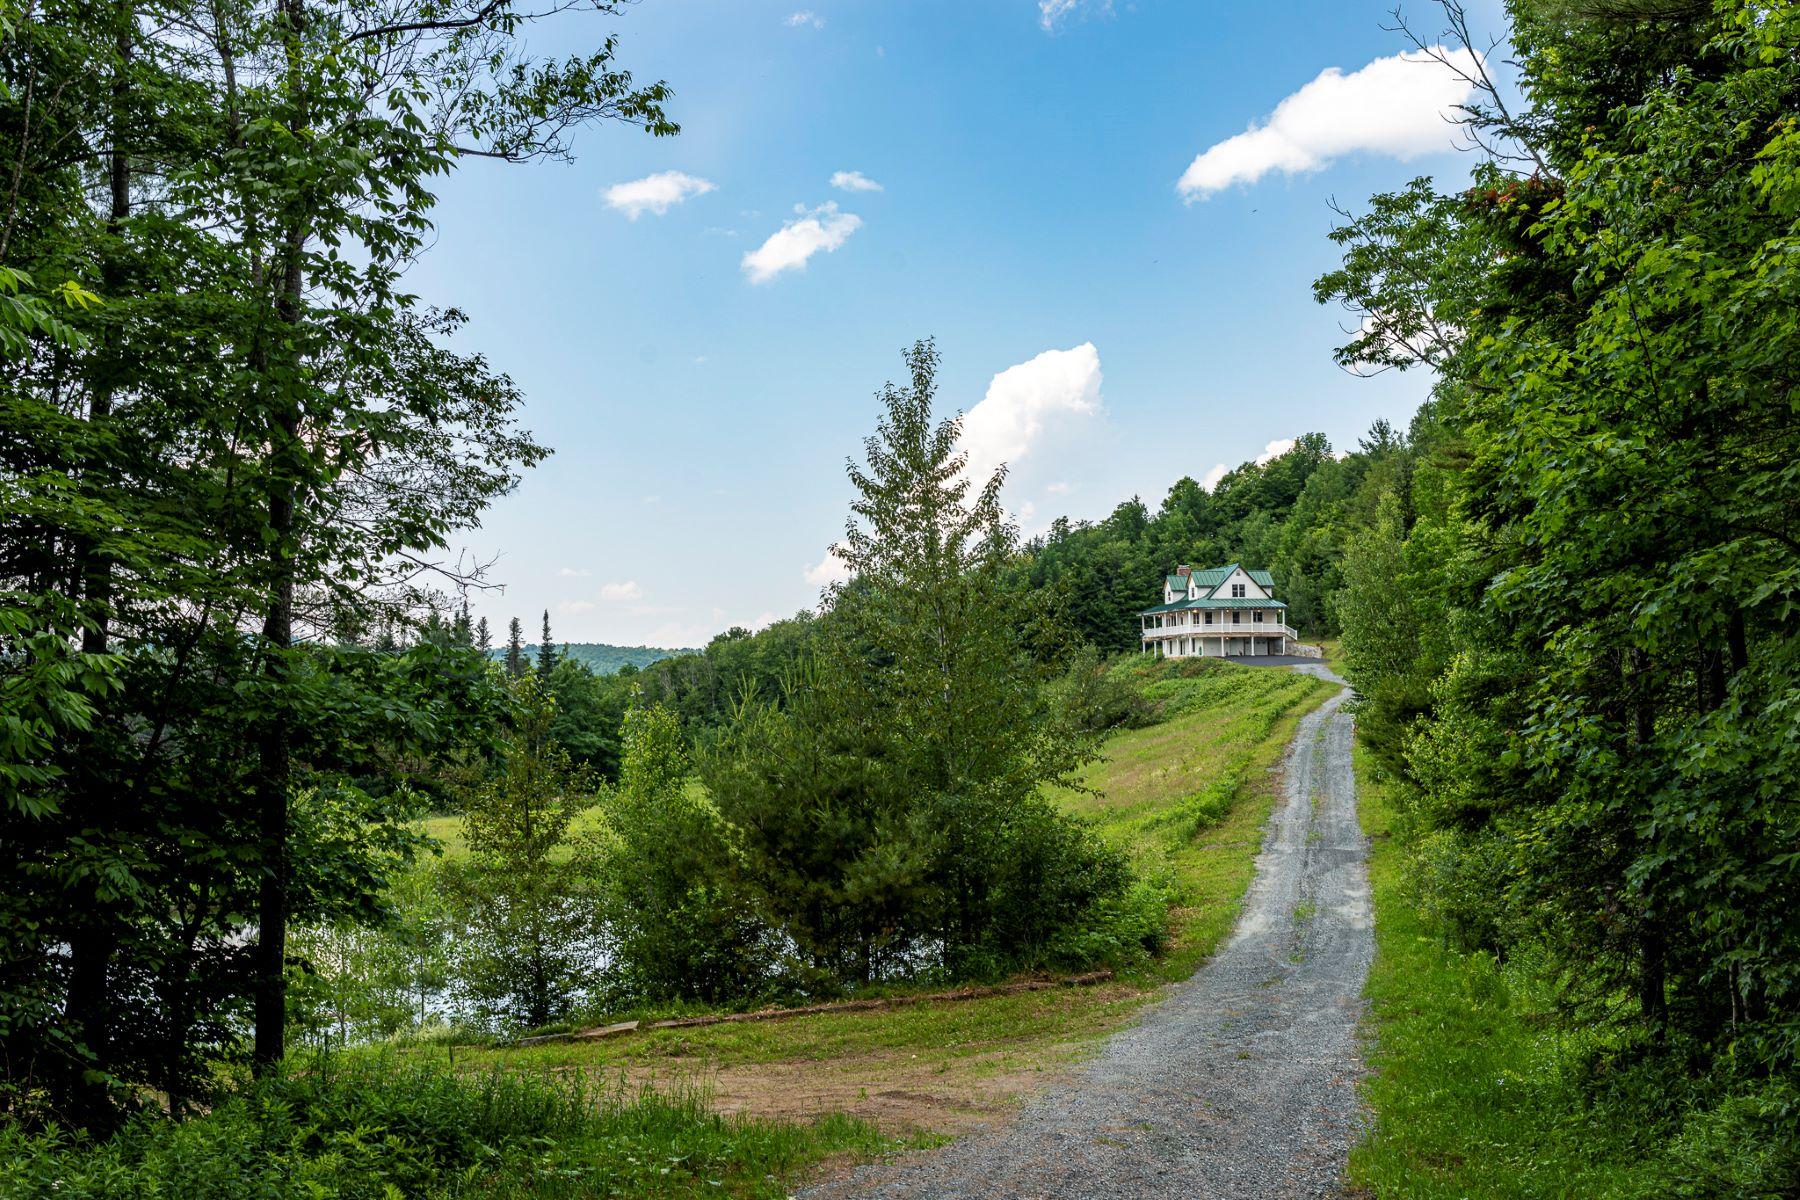 Single Family Homes for Sale at 119 Pennock Road, Strafford 119 Pennock Rd Strafford, Vermont 05072 United States